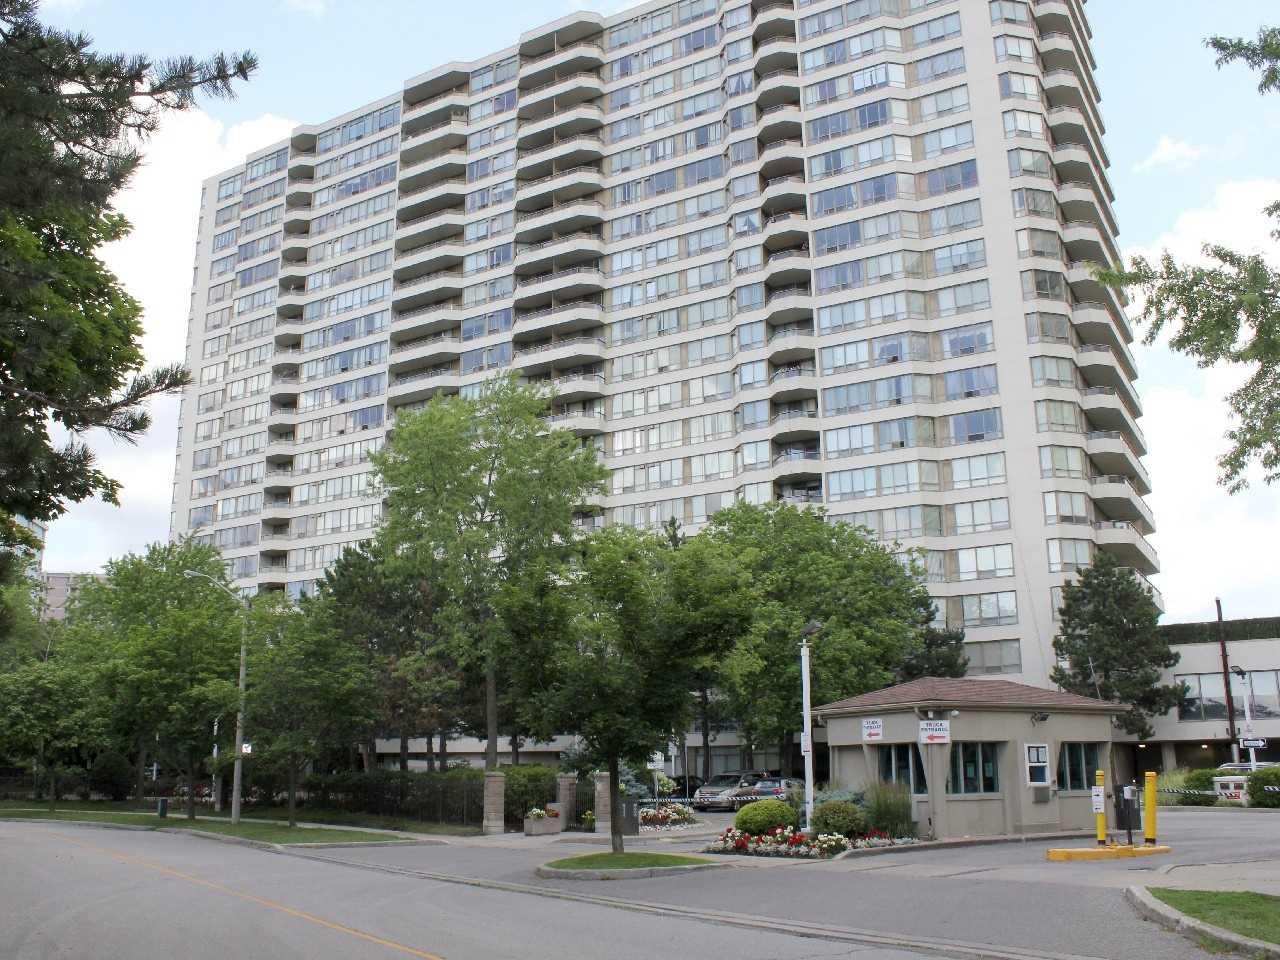 Condo Apt For Sale In Toronto , 2 Bedrooms Bedrooms, ,1 BathroomBathrooms,Condo Apt,For Sale,1208,Greystone Walk